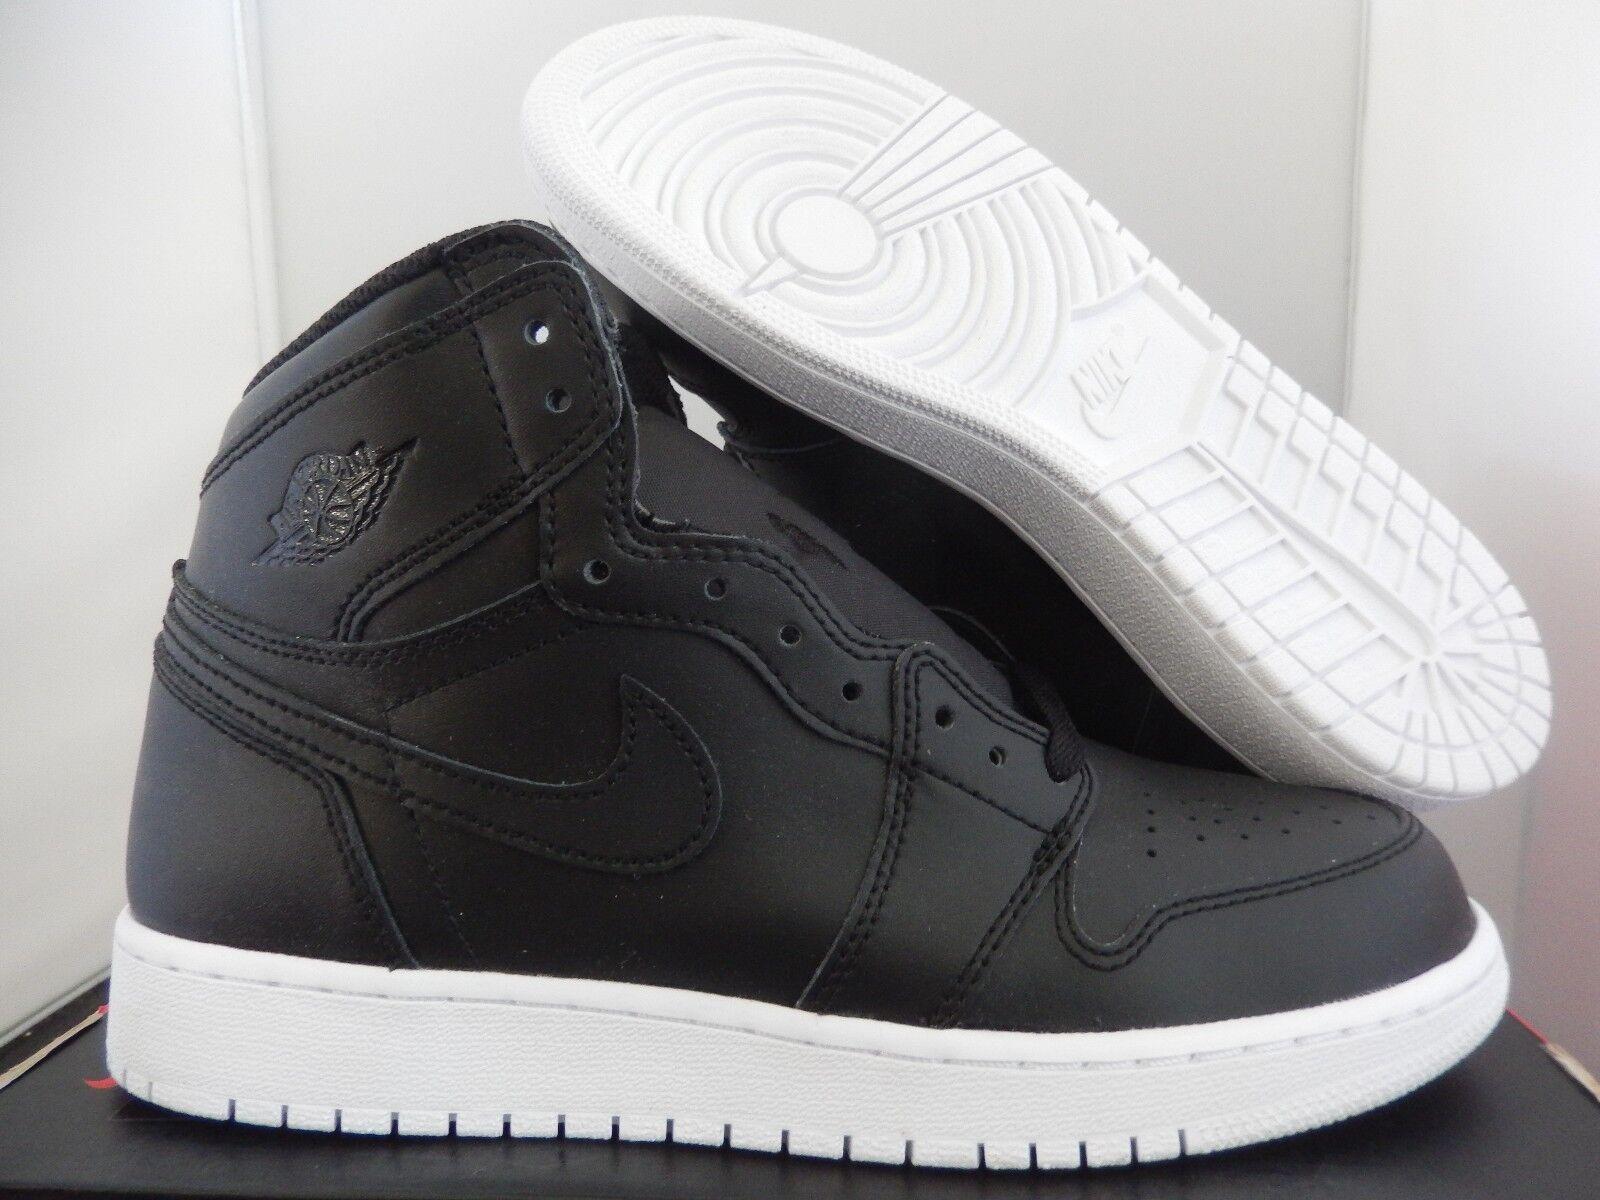 Nike air jordan 1 'alto og bg sz 6y-Donna sz - lunedì (575441-006]